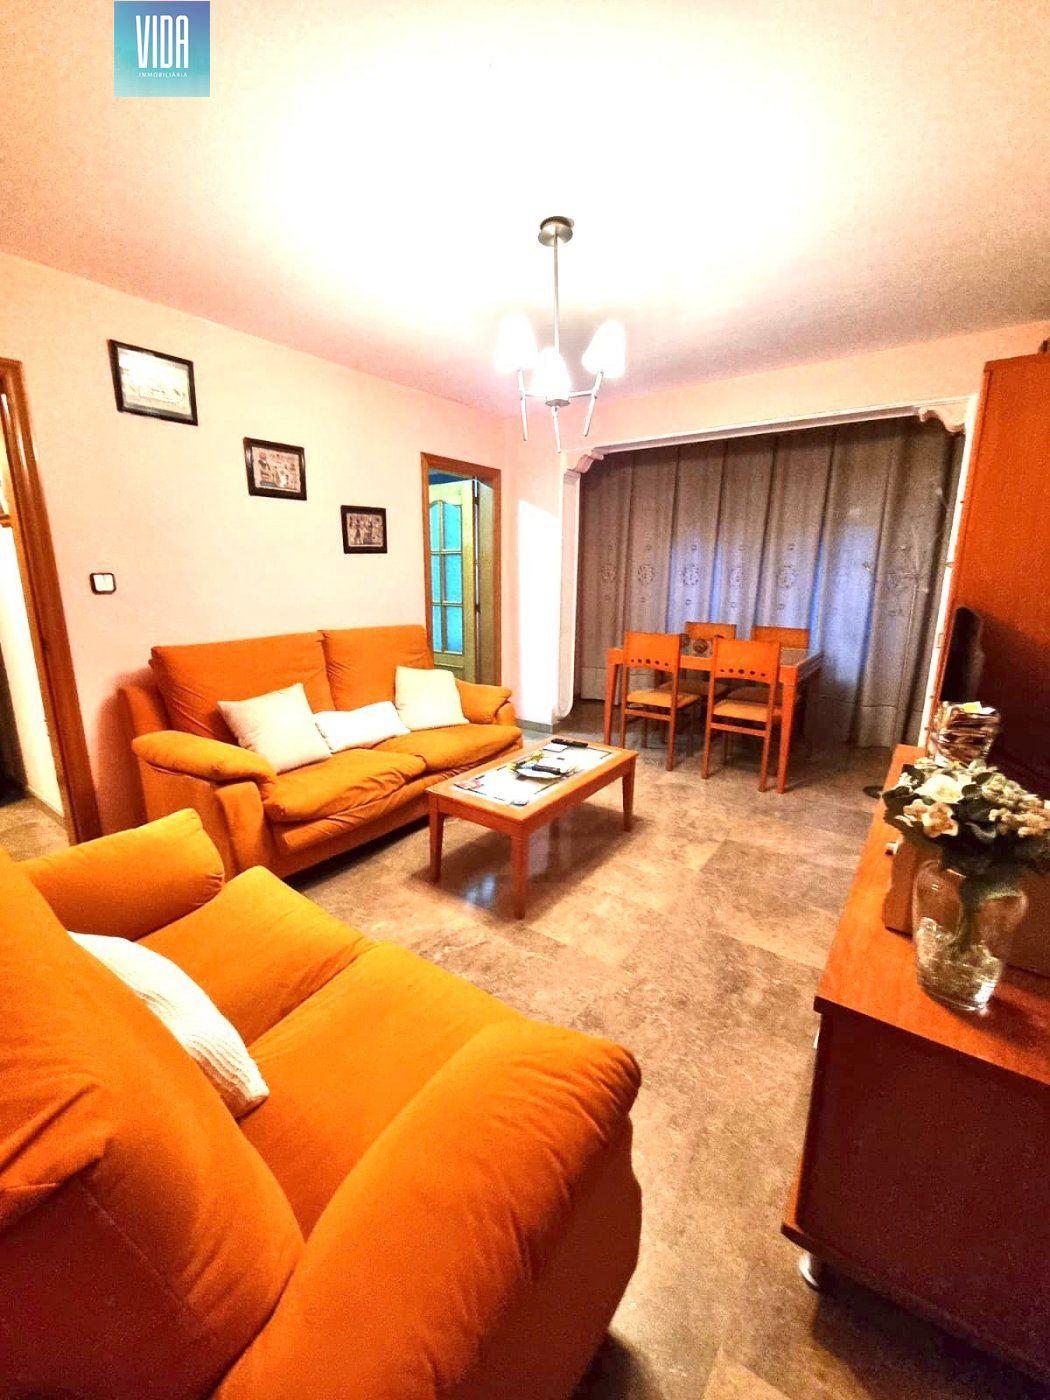 Piso luminoso en venta, de 3 habitaciones en Font dels capellans